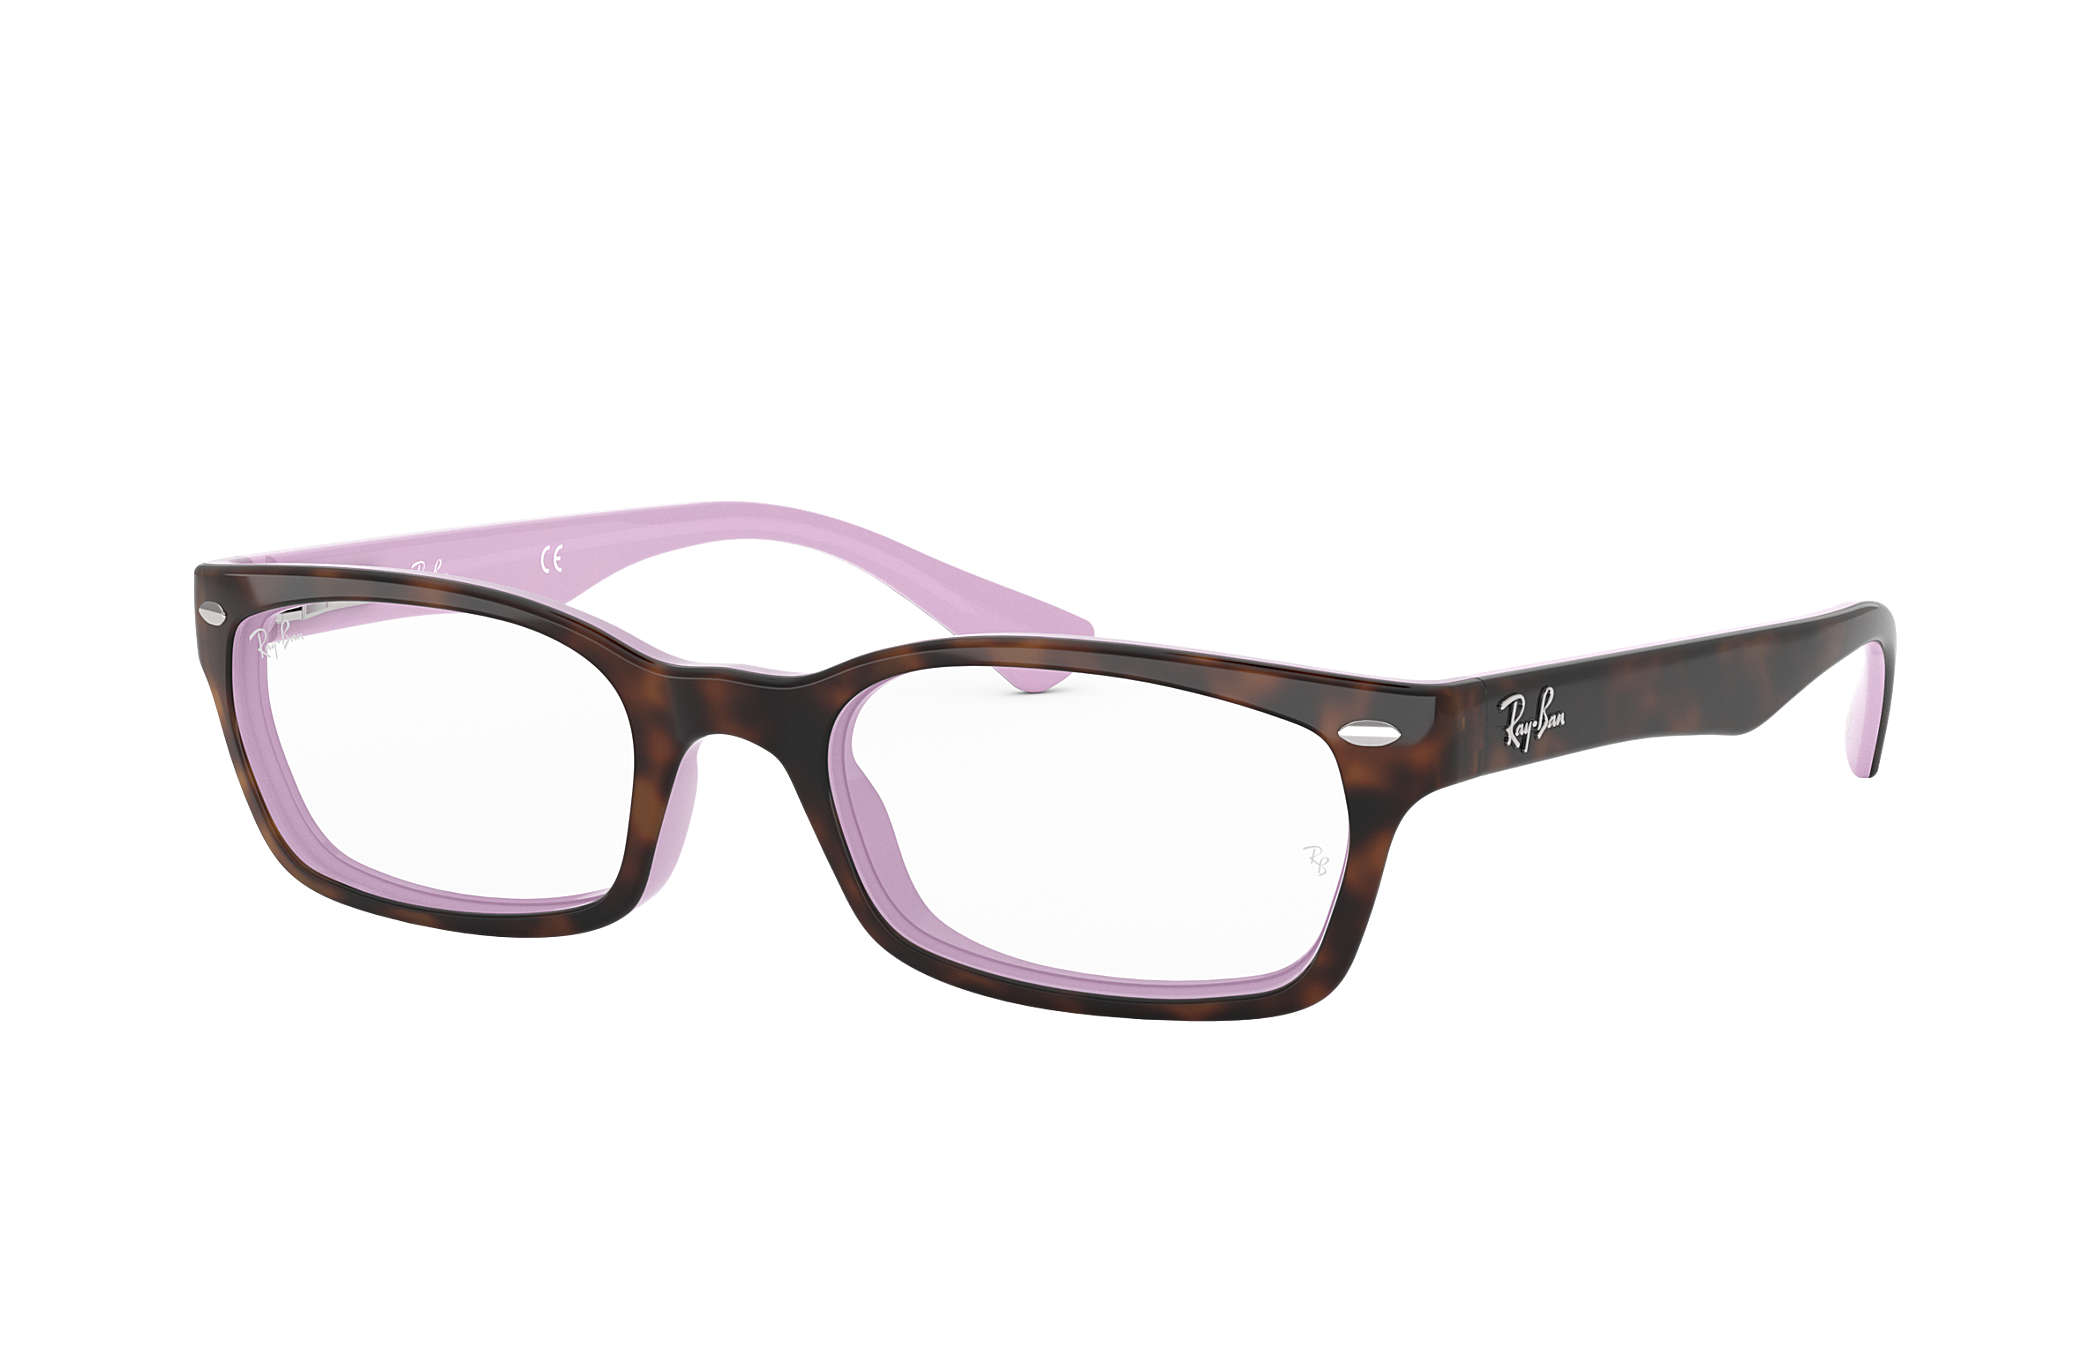 5e336ab756a0 Ray-Ban eyeglasses RB5150 Tortoise - Acetate - 0RX5150524050